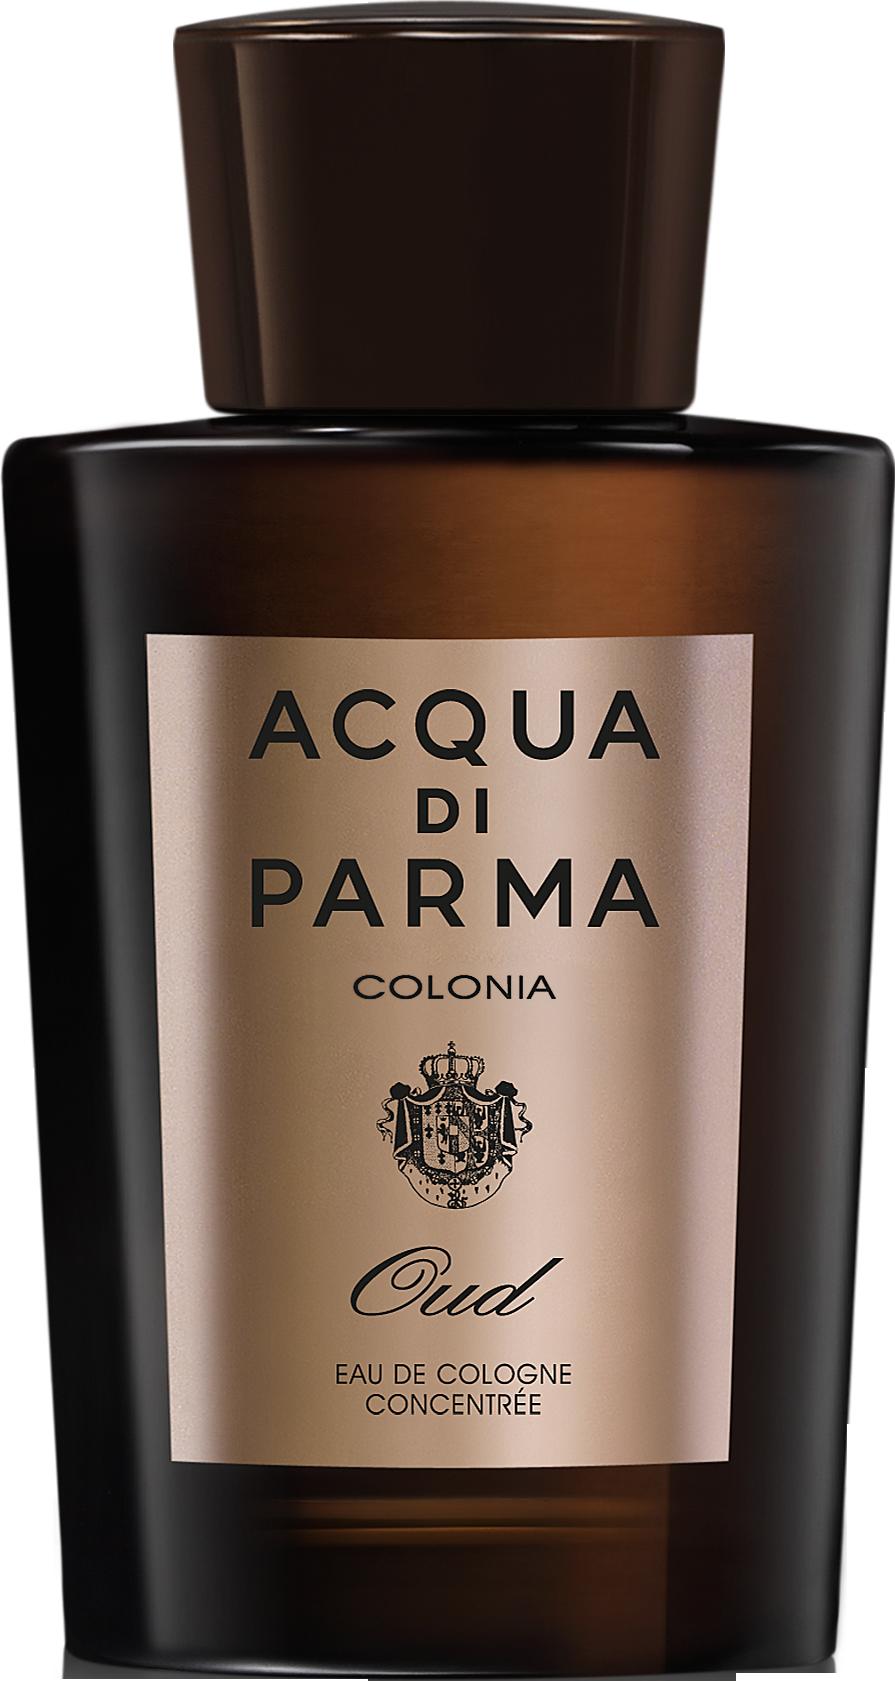 Acqua Di Parma Colonia Oud Eau De Cologne Concentrée Spray In 2019